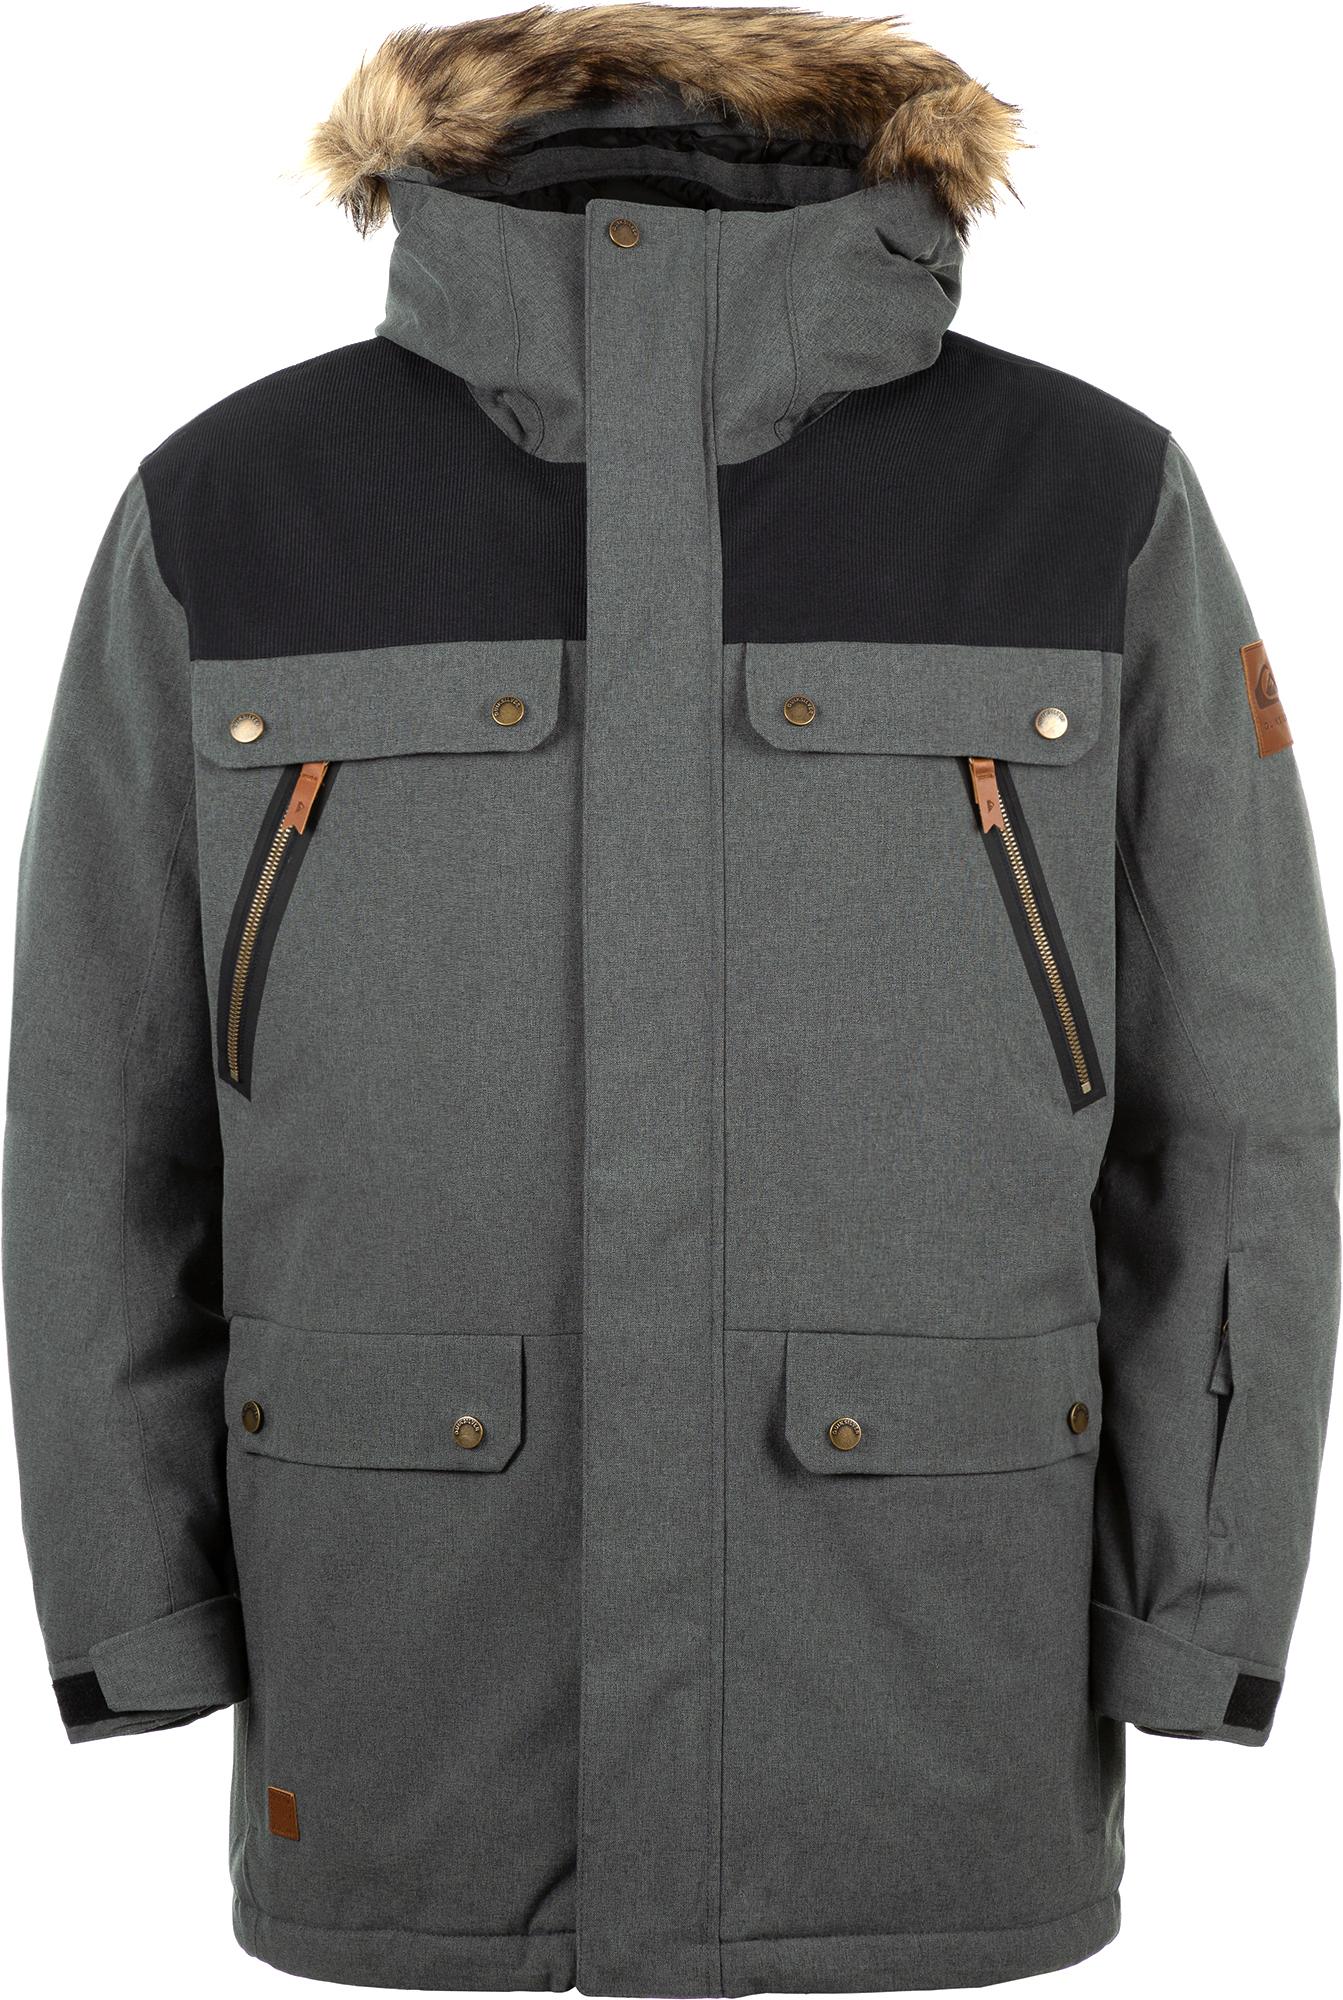 Quiksilver Куртка утепленная мужская Selector Jk, размер 52-54